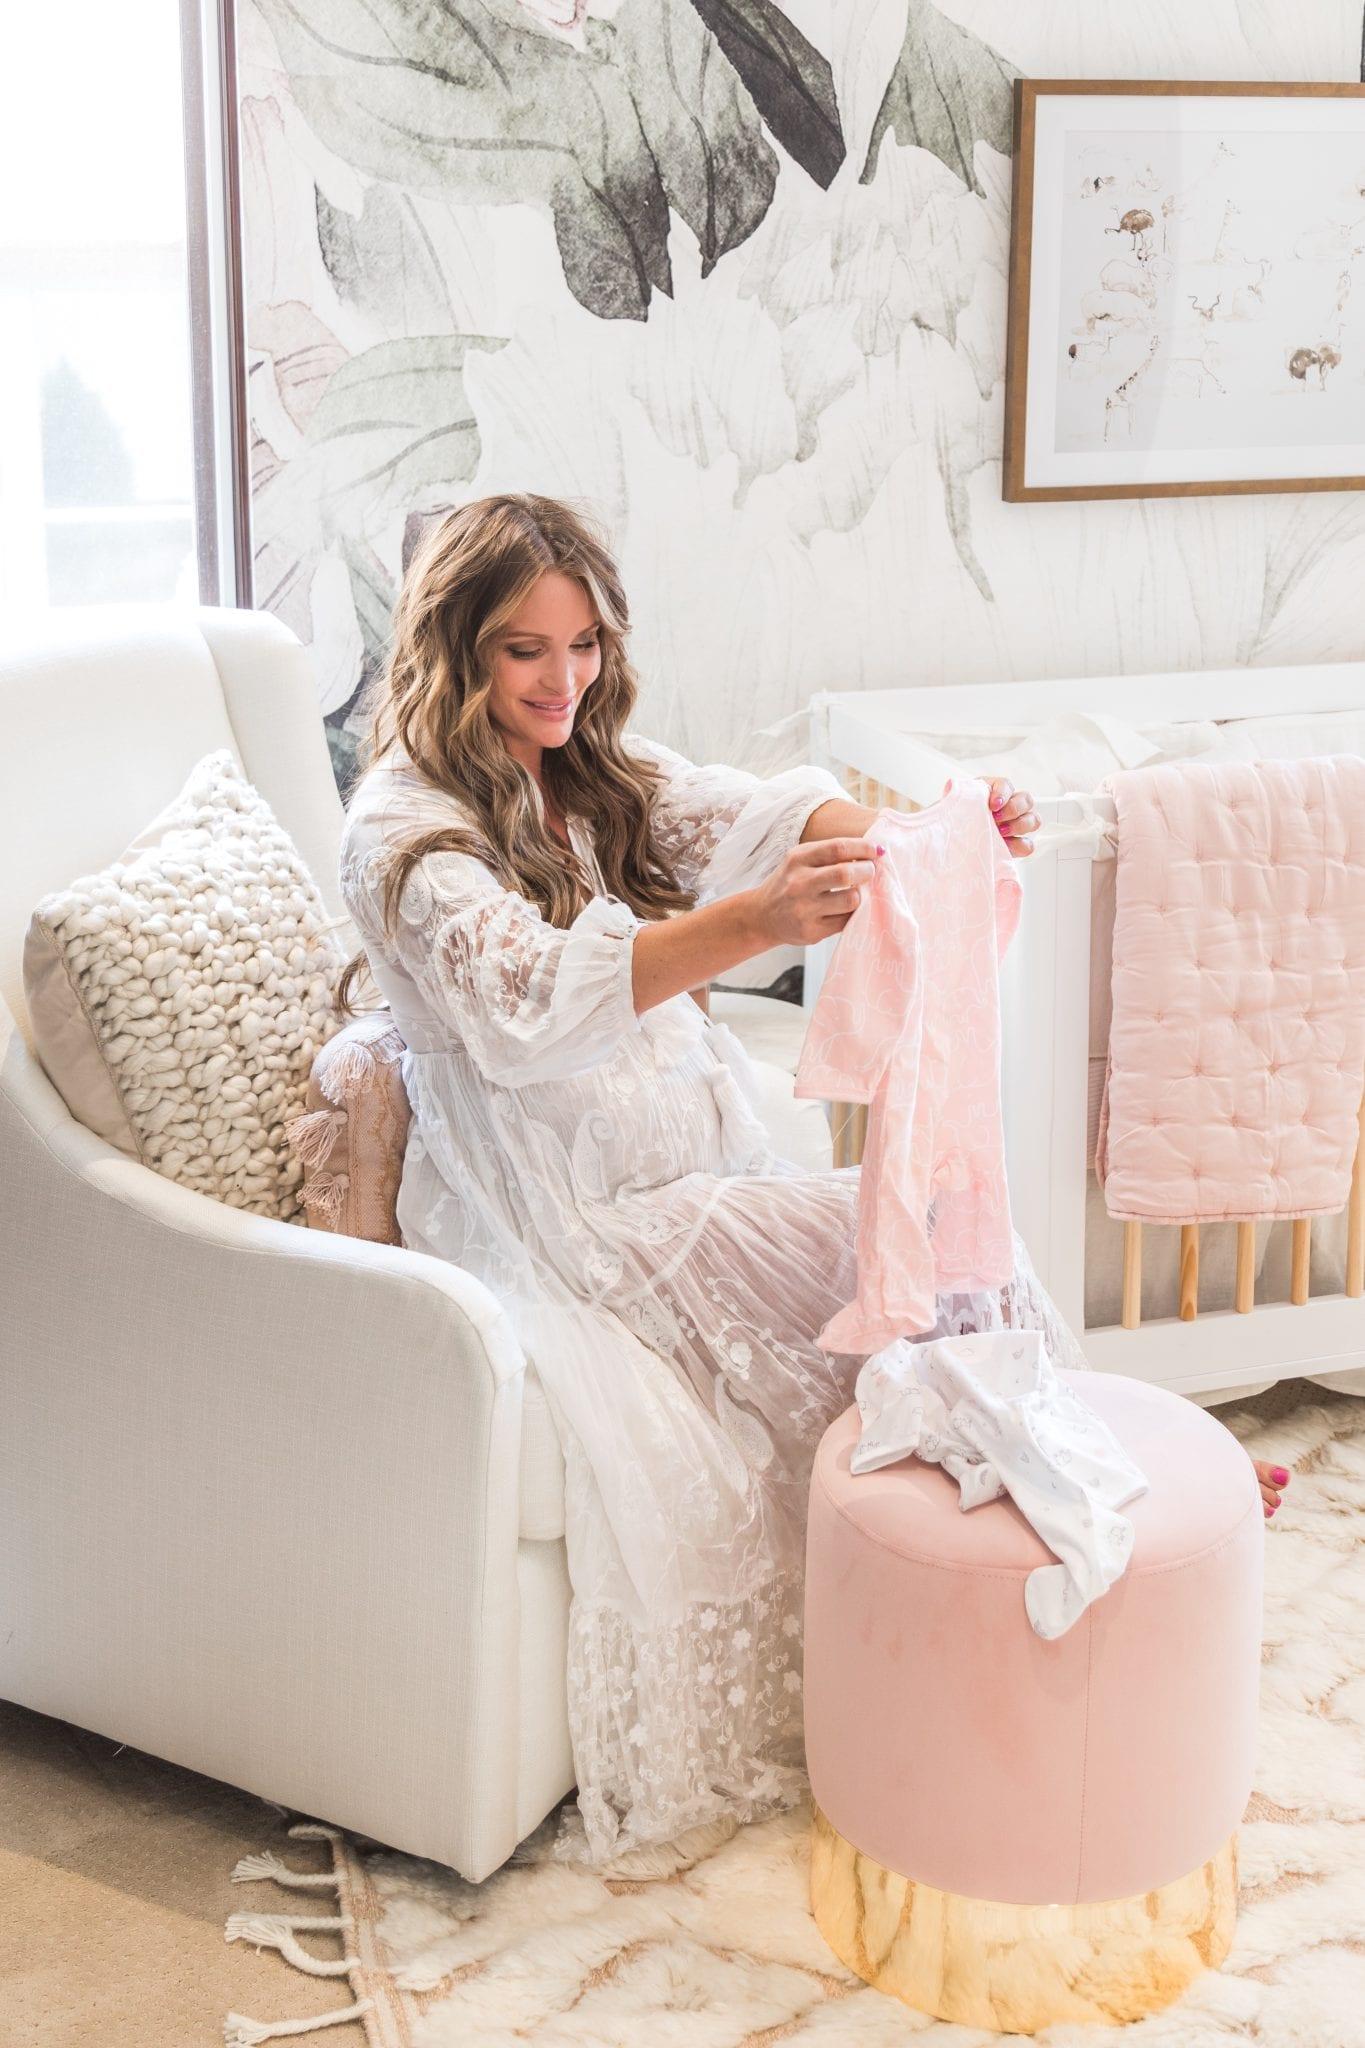 Danielle K White - Nursery Interior